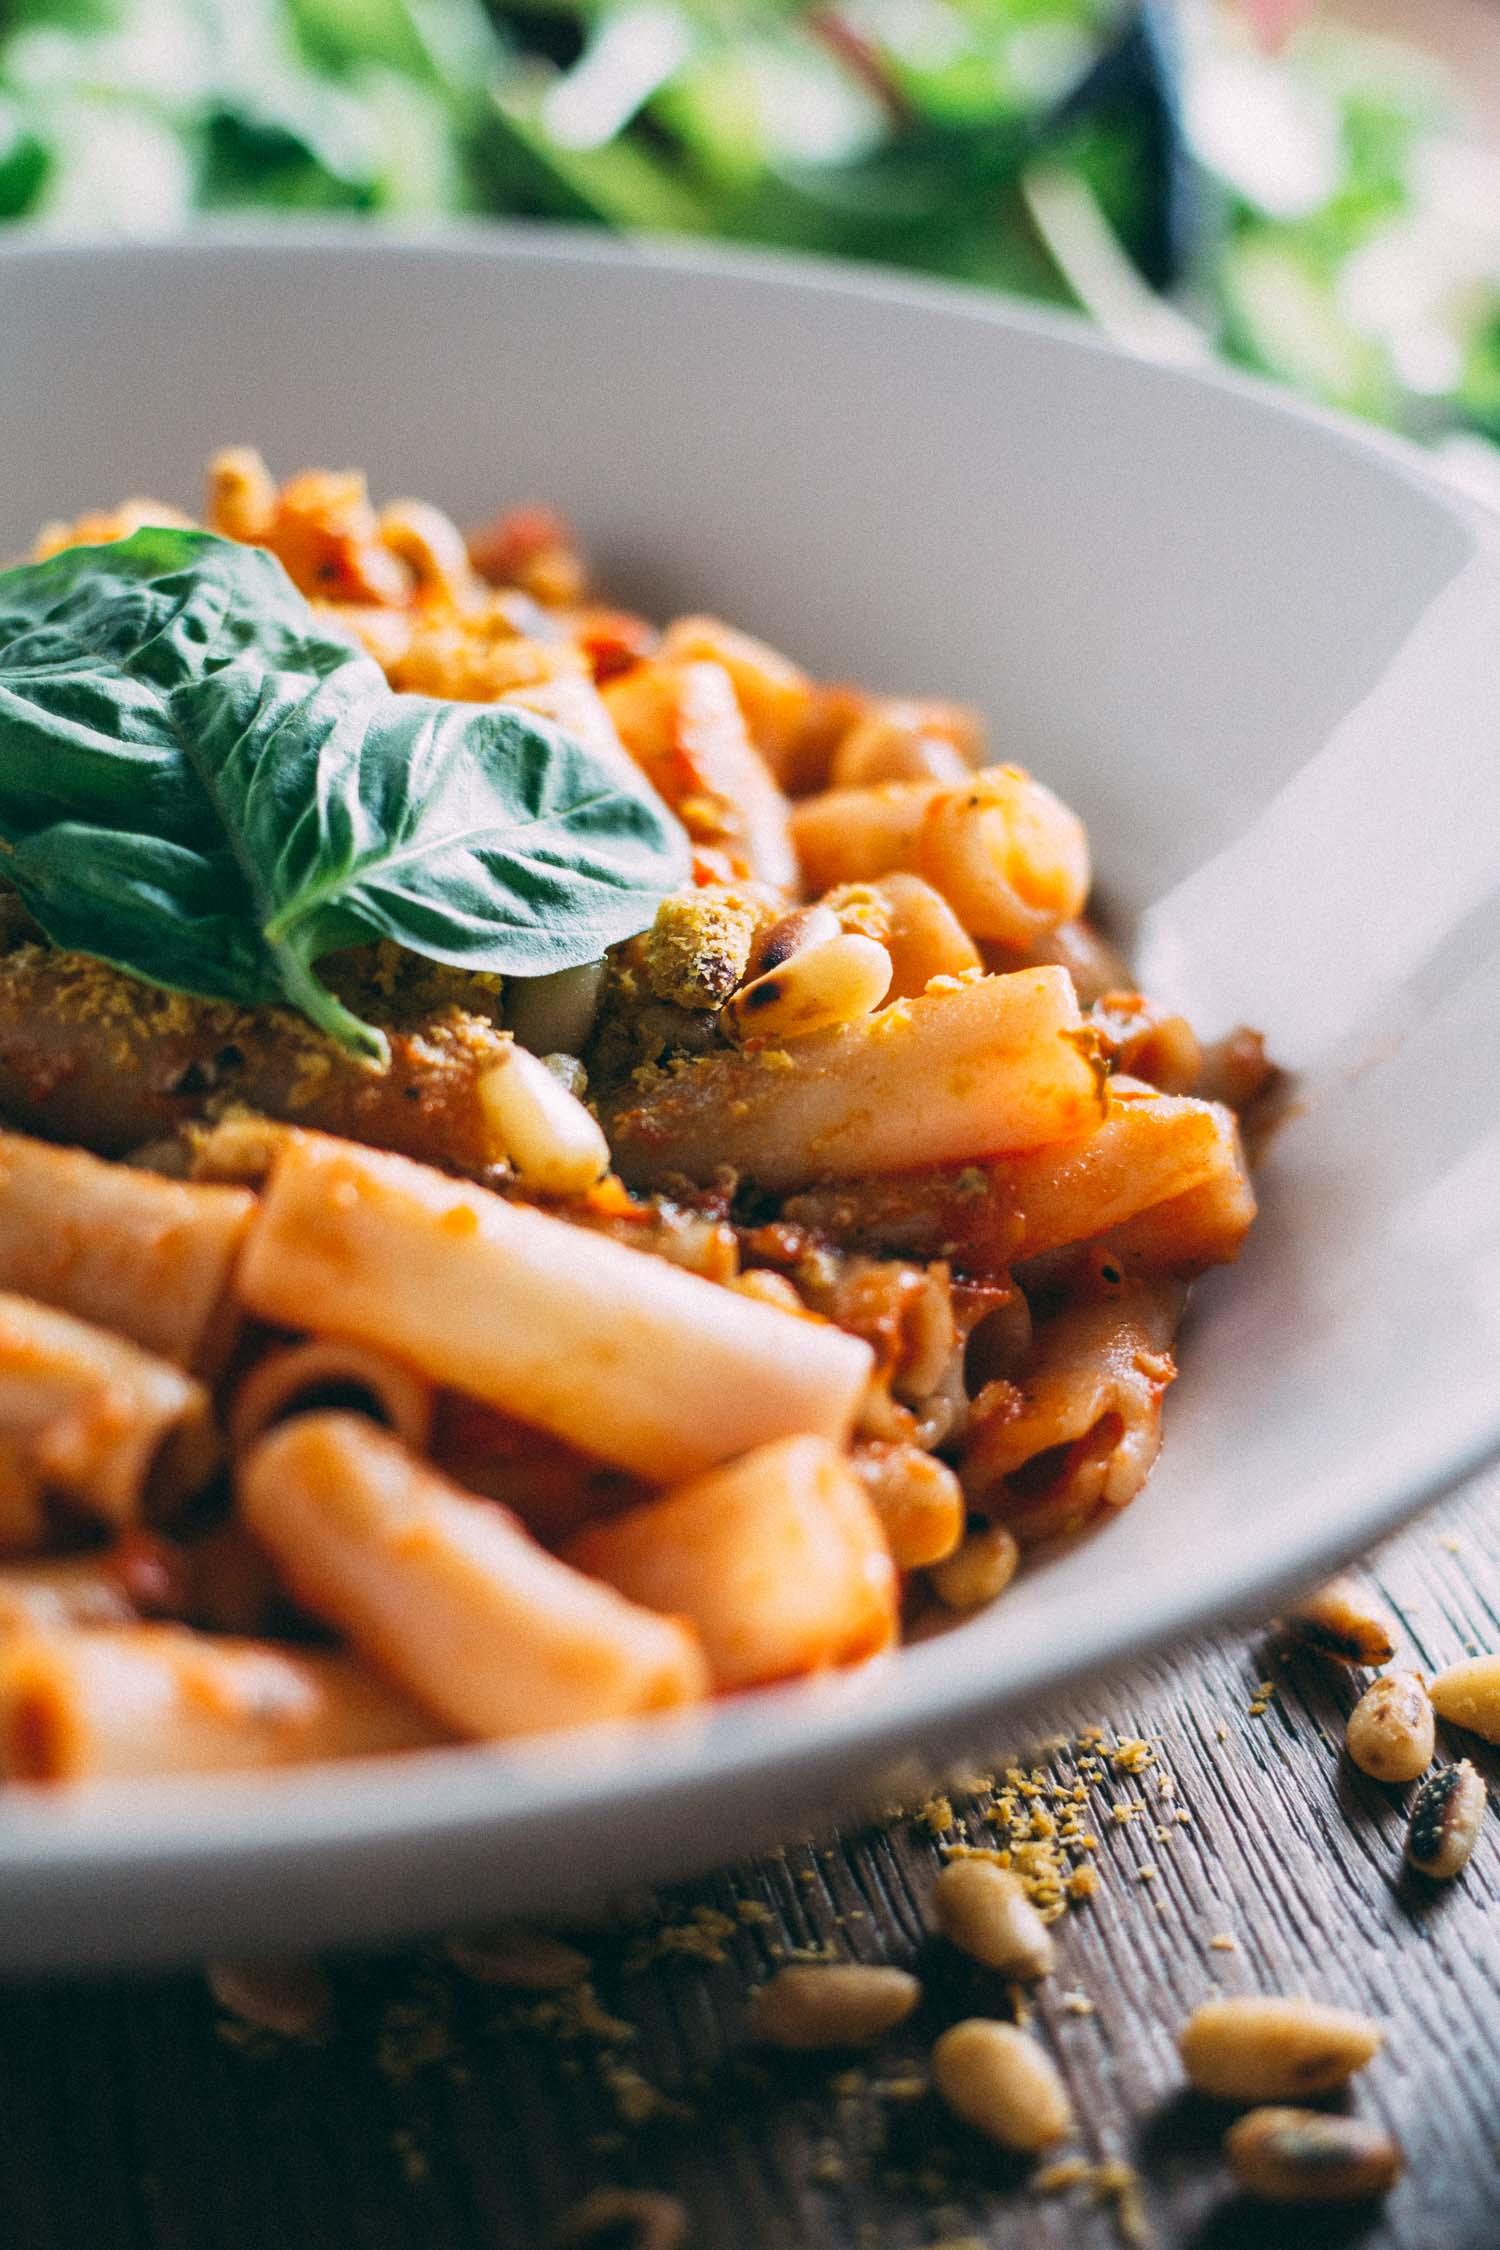 Sun-Dried Tomato Best-o Pesto Pasta #gluten-free #basil #nocook